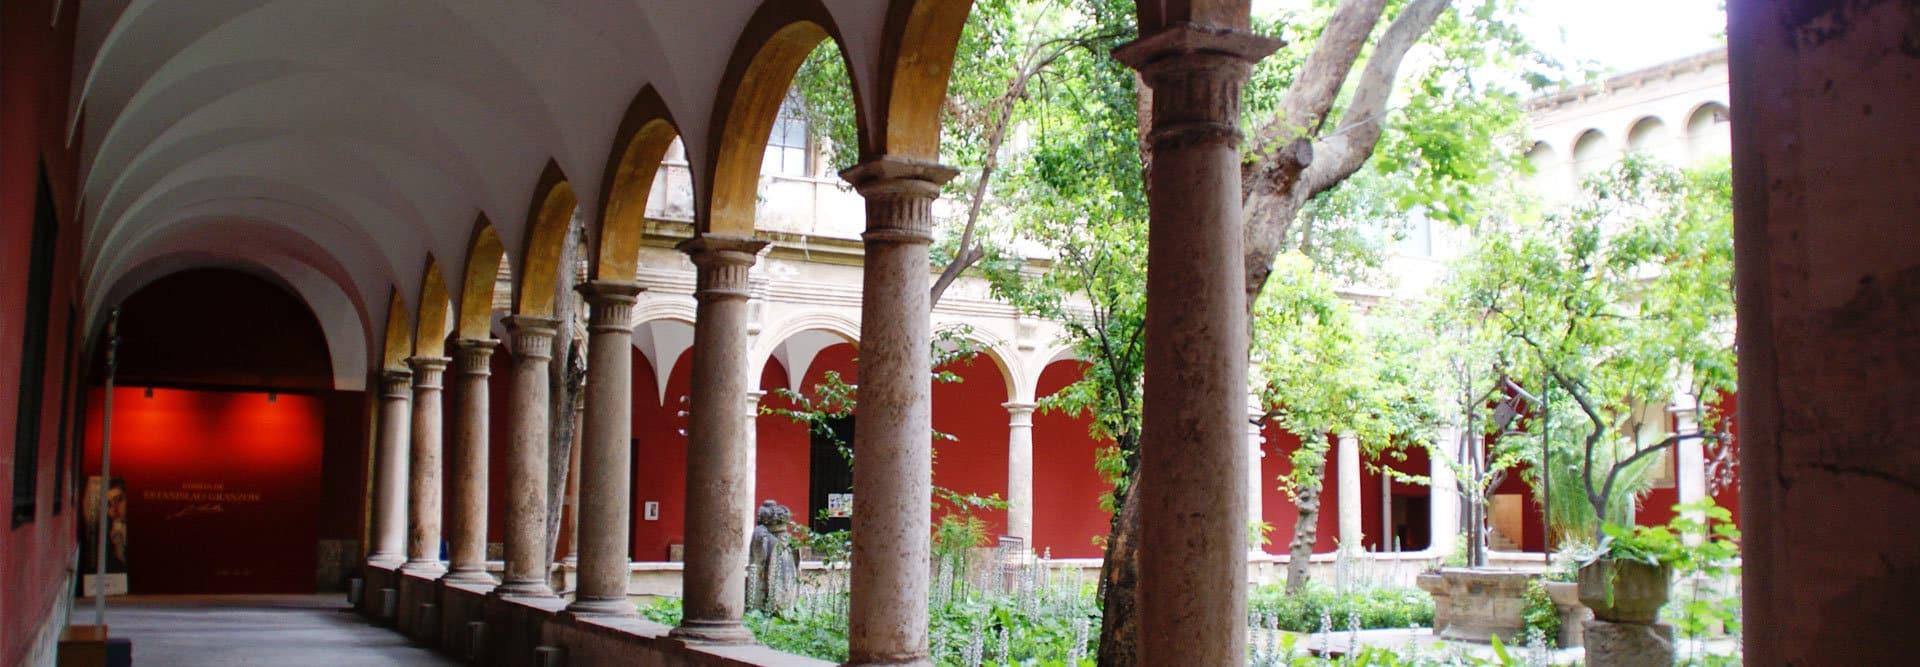 Centre-del-Carme-valencia-experiences-and-gateways